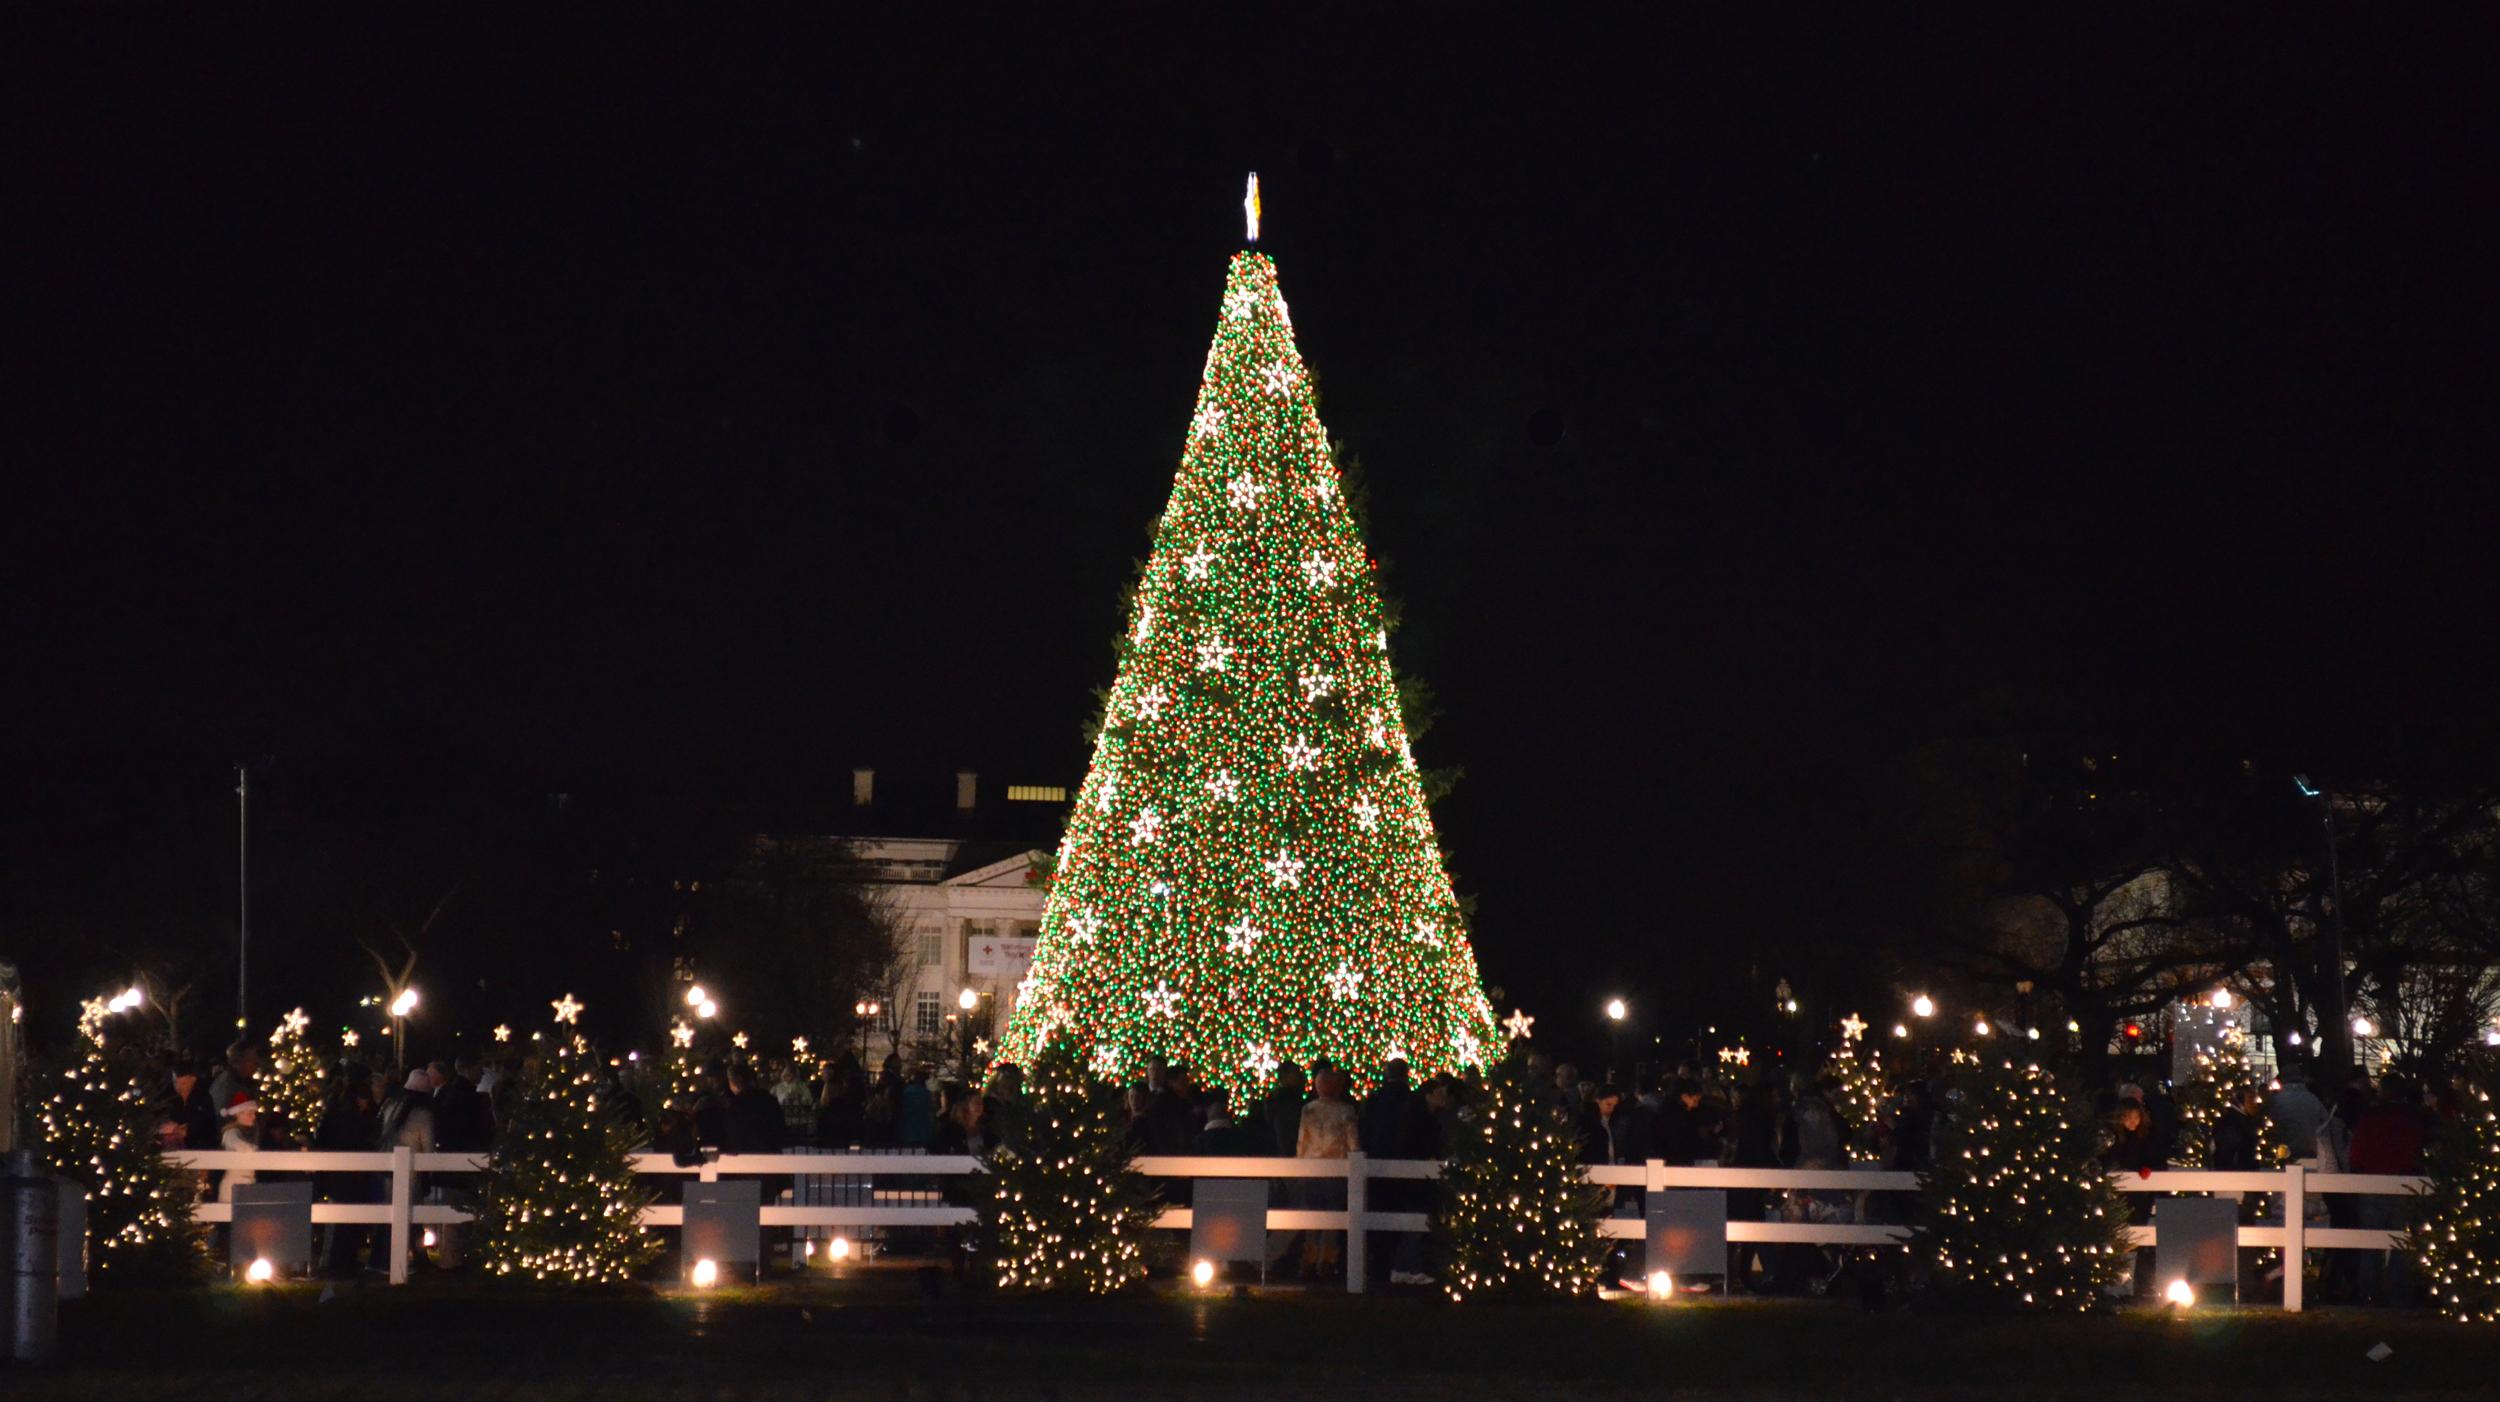 [url=https://flic.kr/p/22LpXP4][img]https://farm5.staticflickr.com/4726/39227650461_20d1cf22ec_o.jpg[/img][/url][url=https://flic.kr/p/22LpXP4]US_National_Christmas_Tree_2012[/url] by [url=https://www.flickr.com/photos/am-jochim/]Mark Jochim[/url], on Flickr